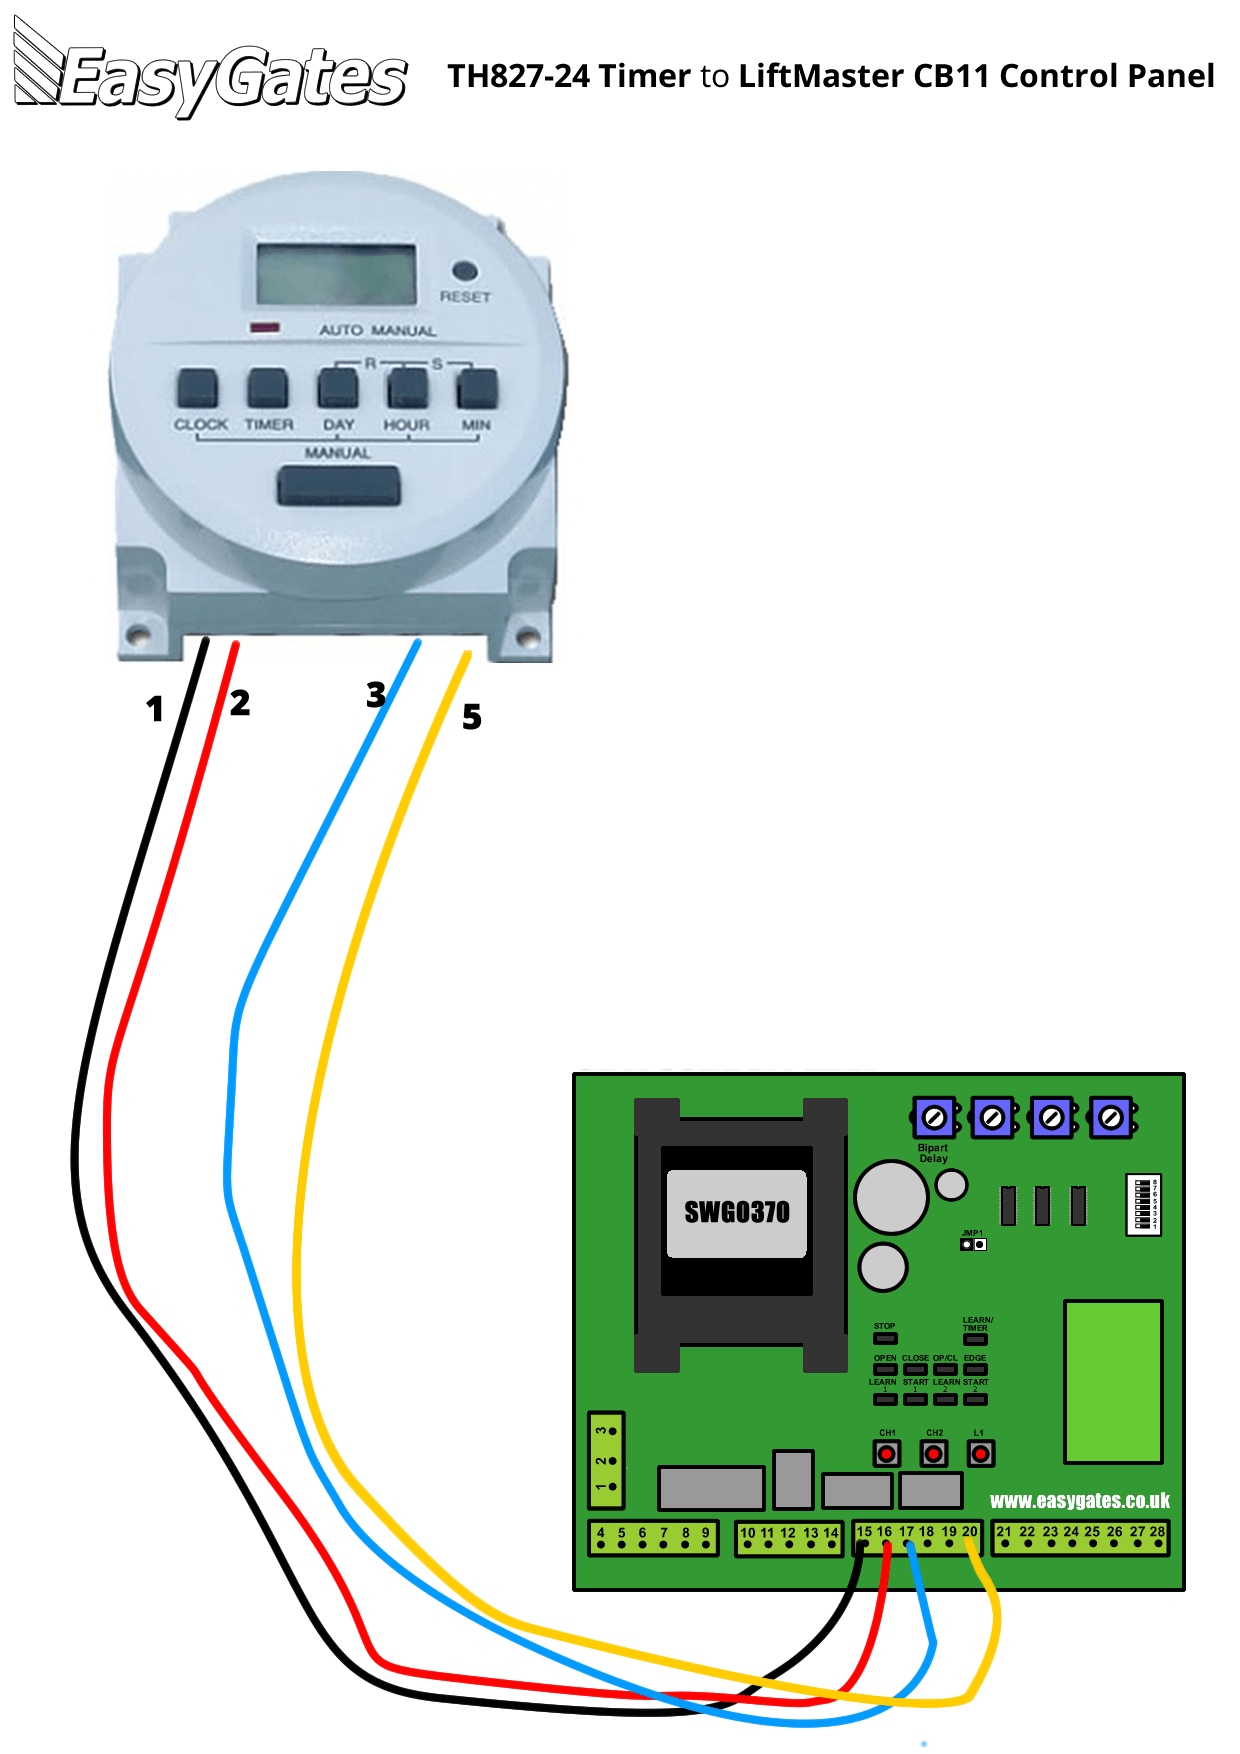 Liftmaster Wiring Diagram Sensors | Manual E-Books - Liftmaster Garage Door Opener Wiring Diagram